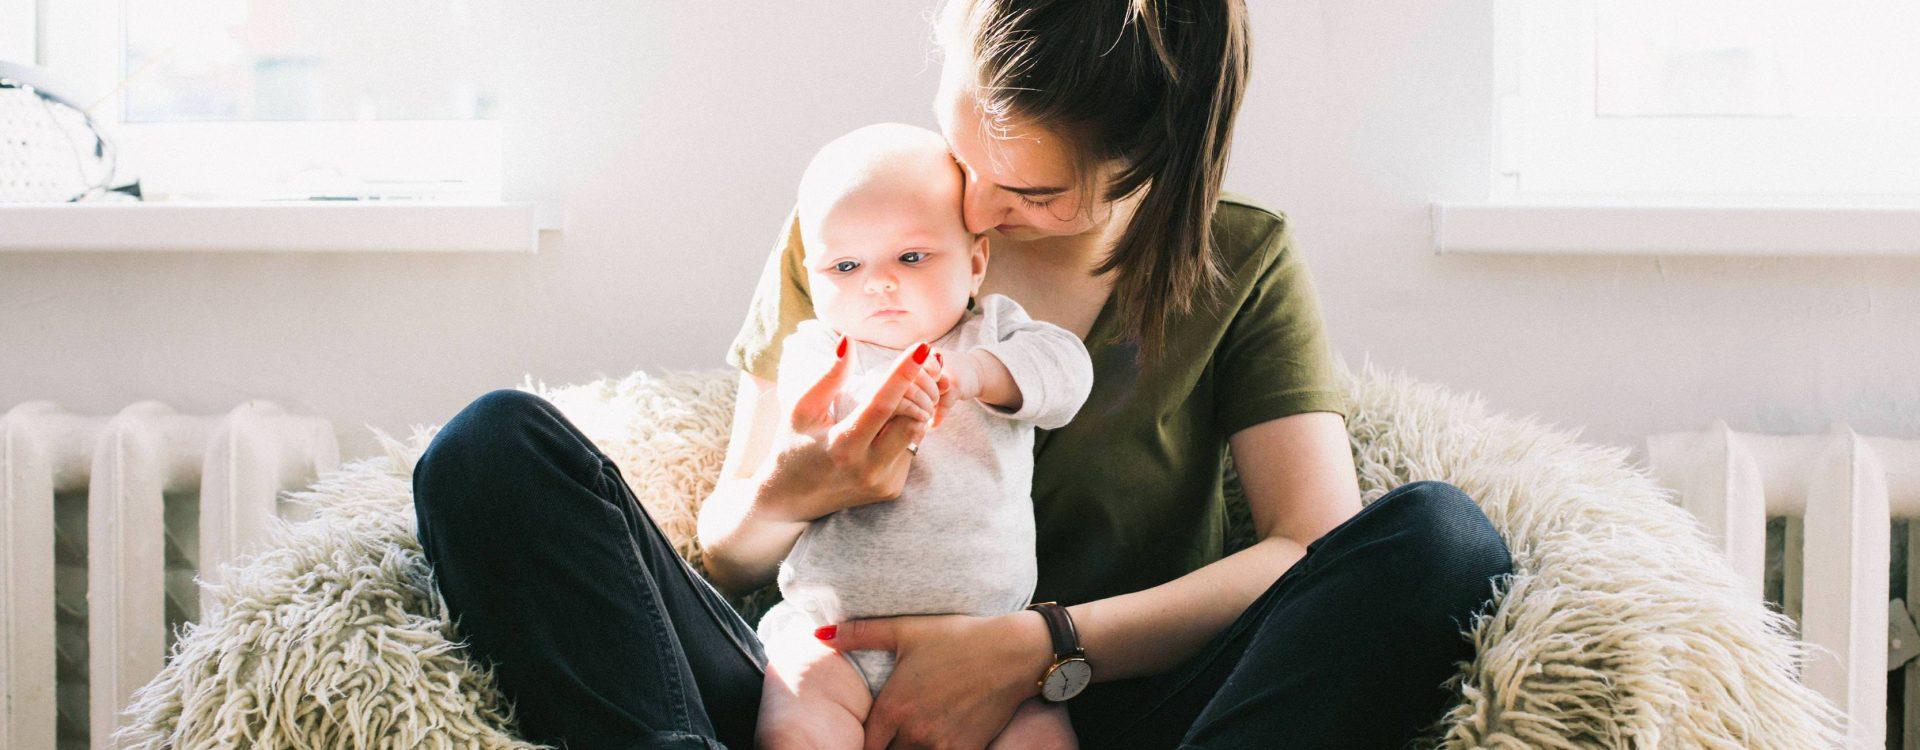 Modern Moms – Tips for Balancing Your Life